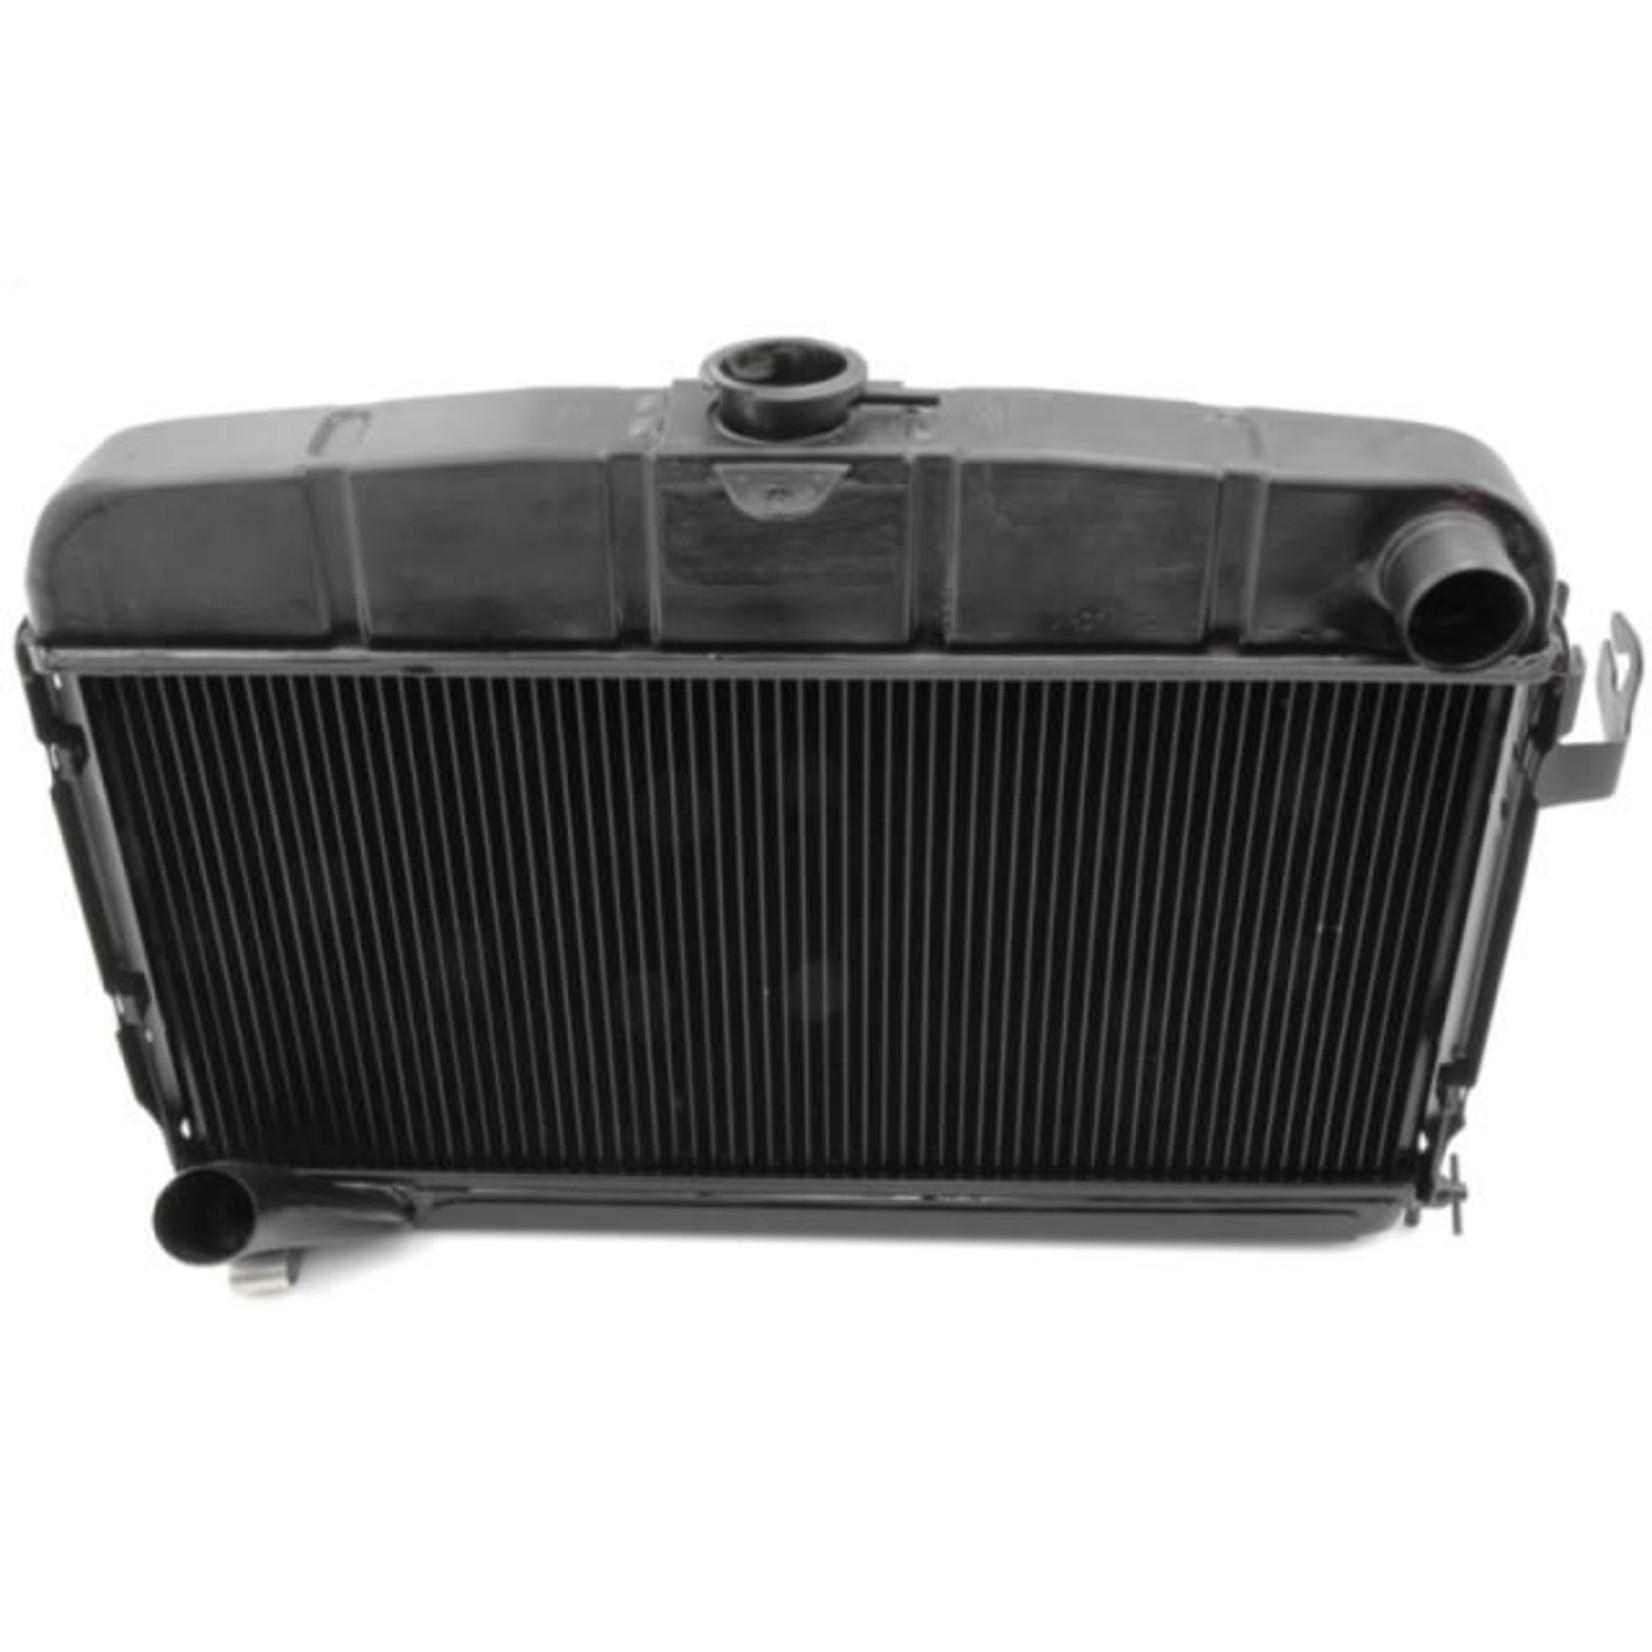 Radiador con soporte capo reaconditionado 62-65